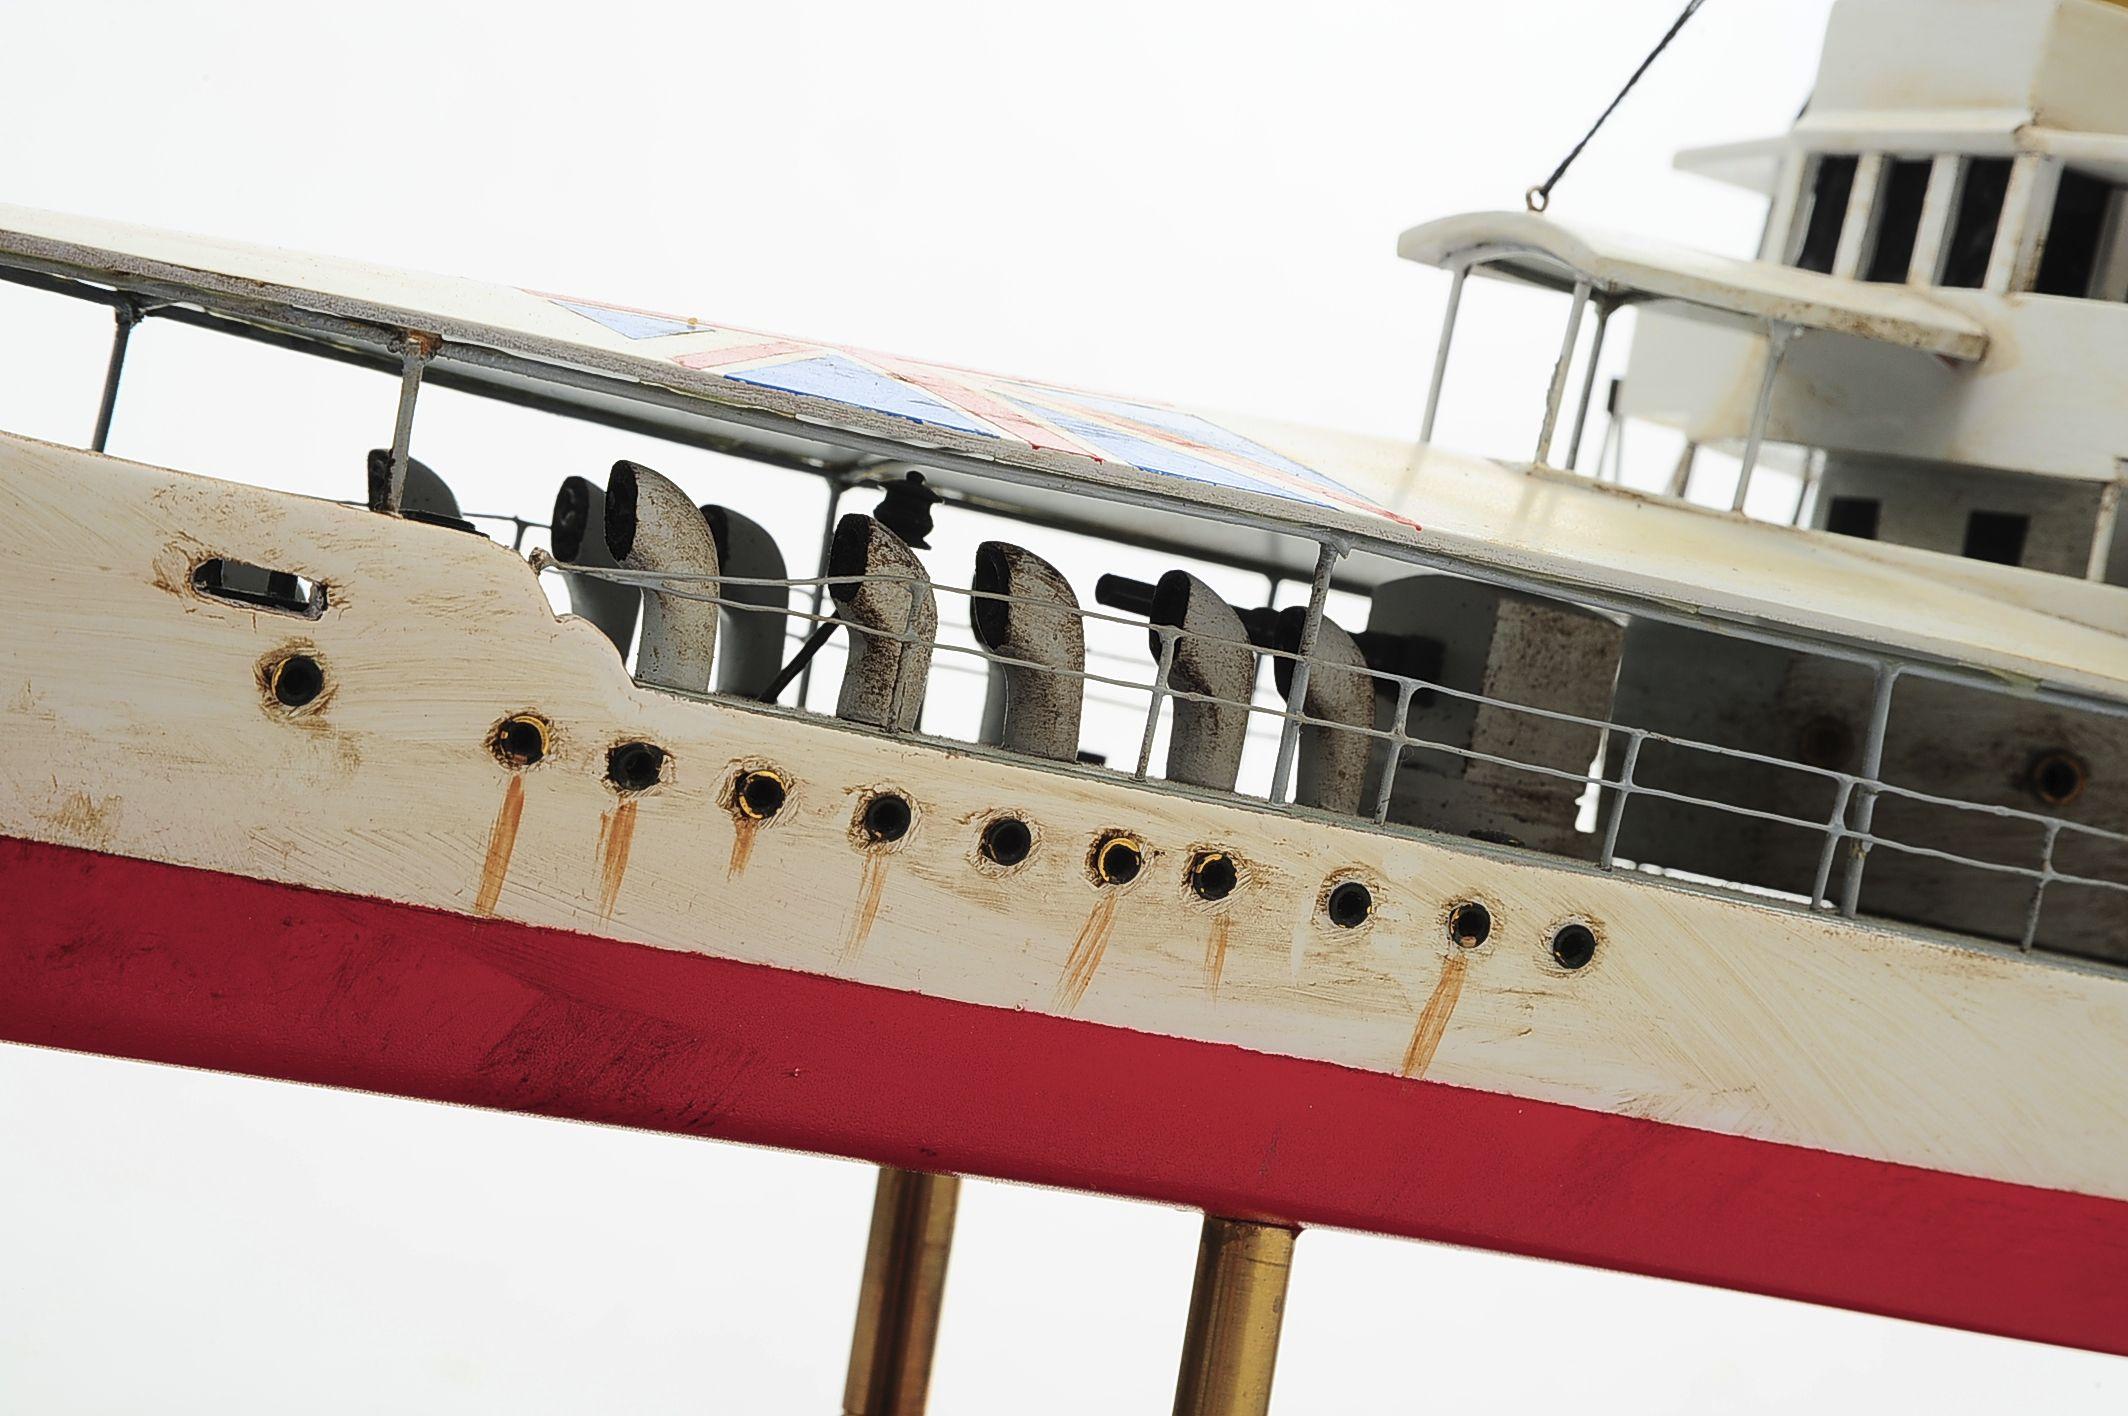 1392-6189-HMS-Cockchafer-Premier-Range